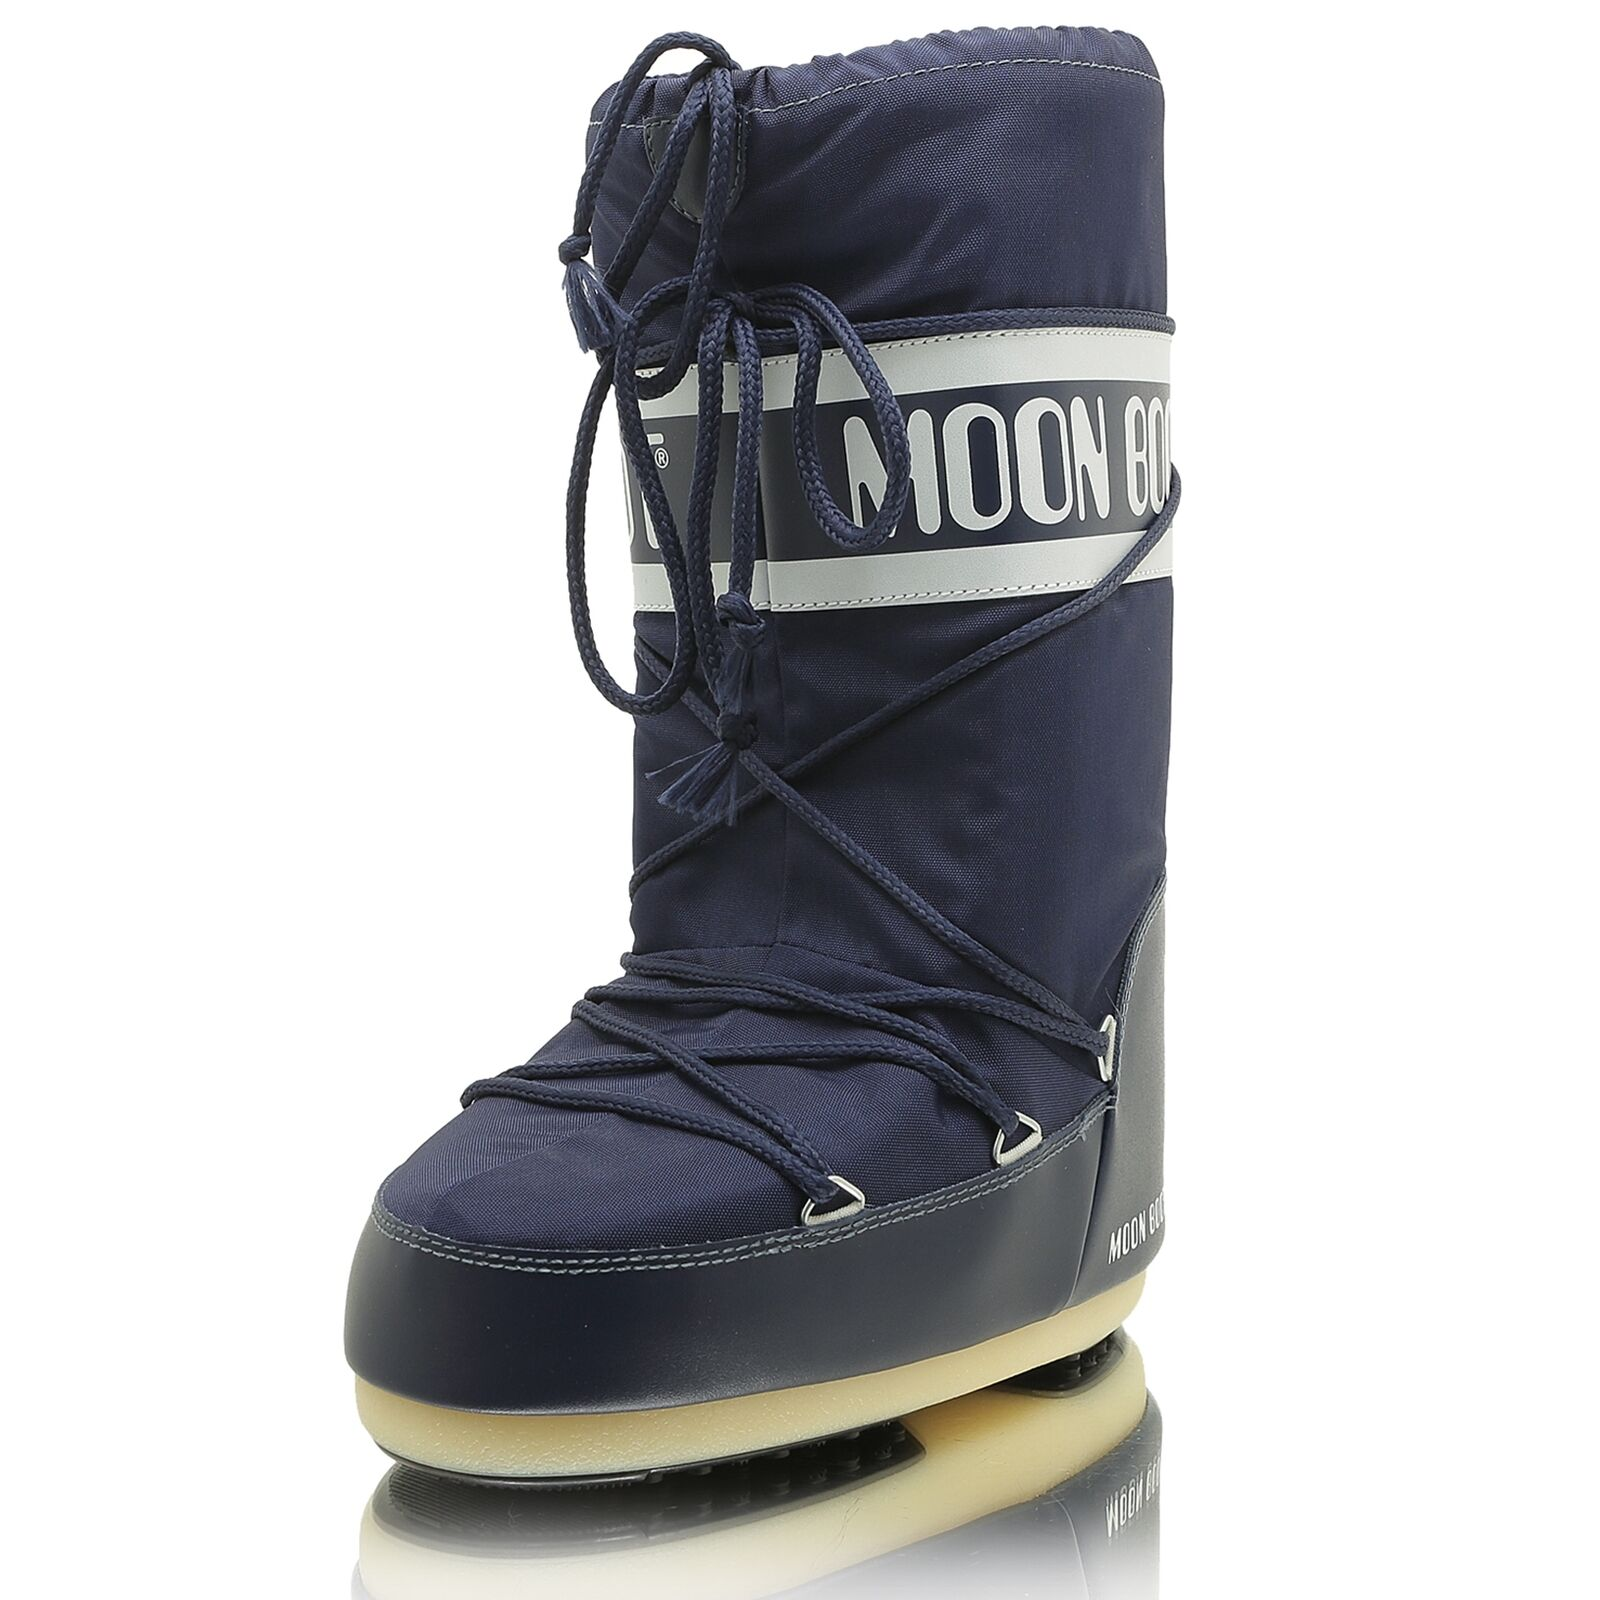 Moon bota Moon bota bota bota nylon azul  barato